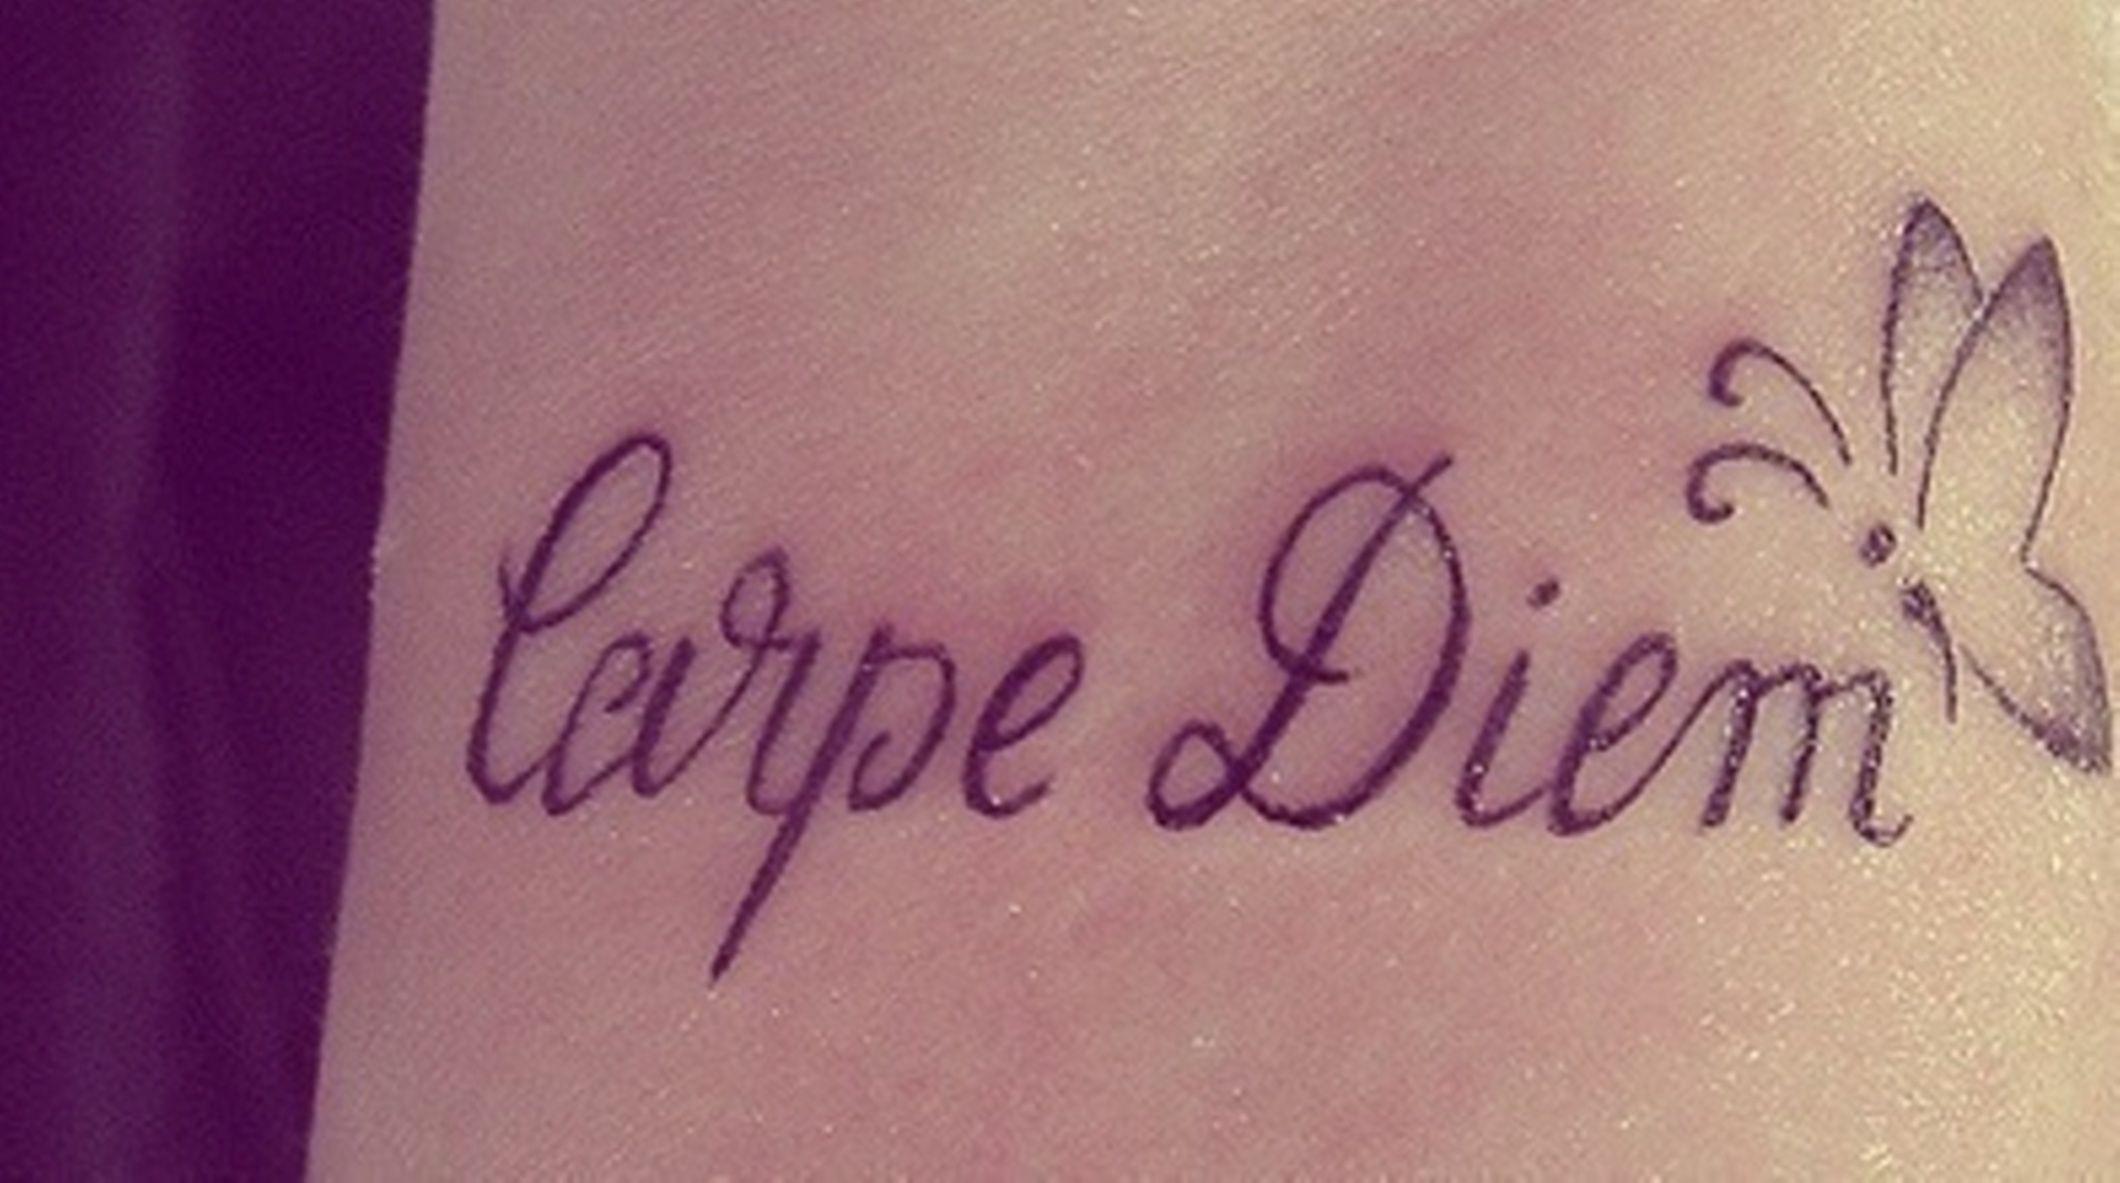 Carpe Diem Tatuaże Tatuaże